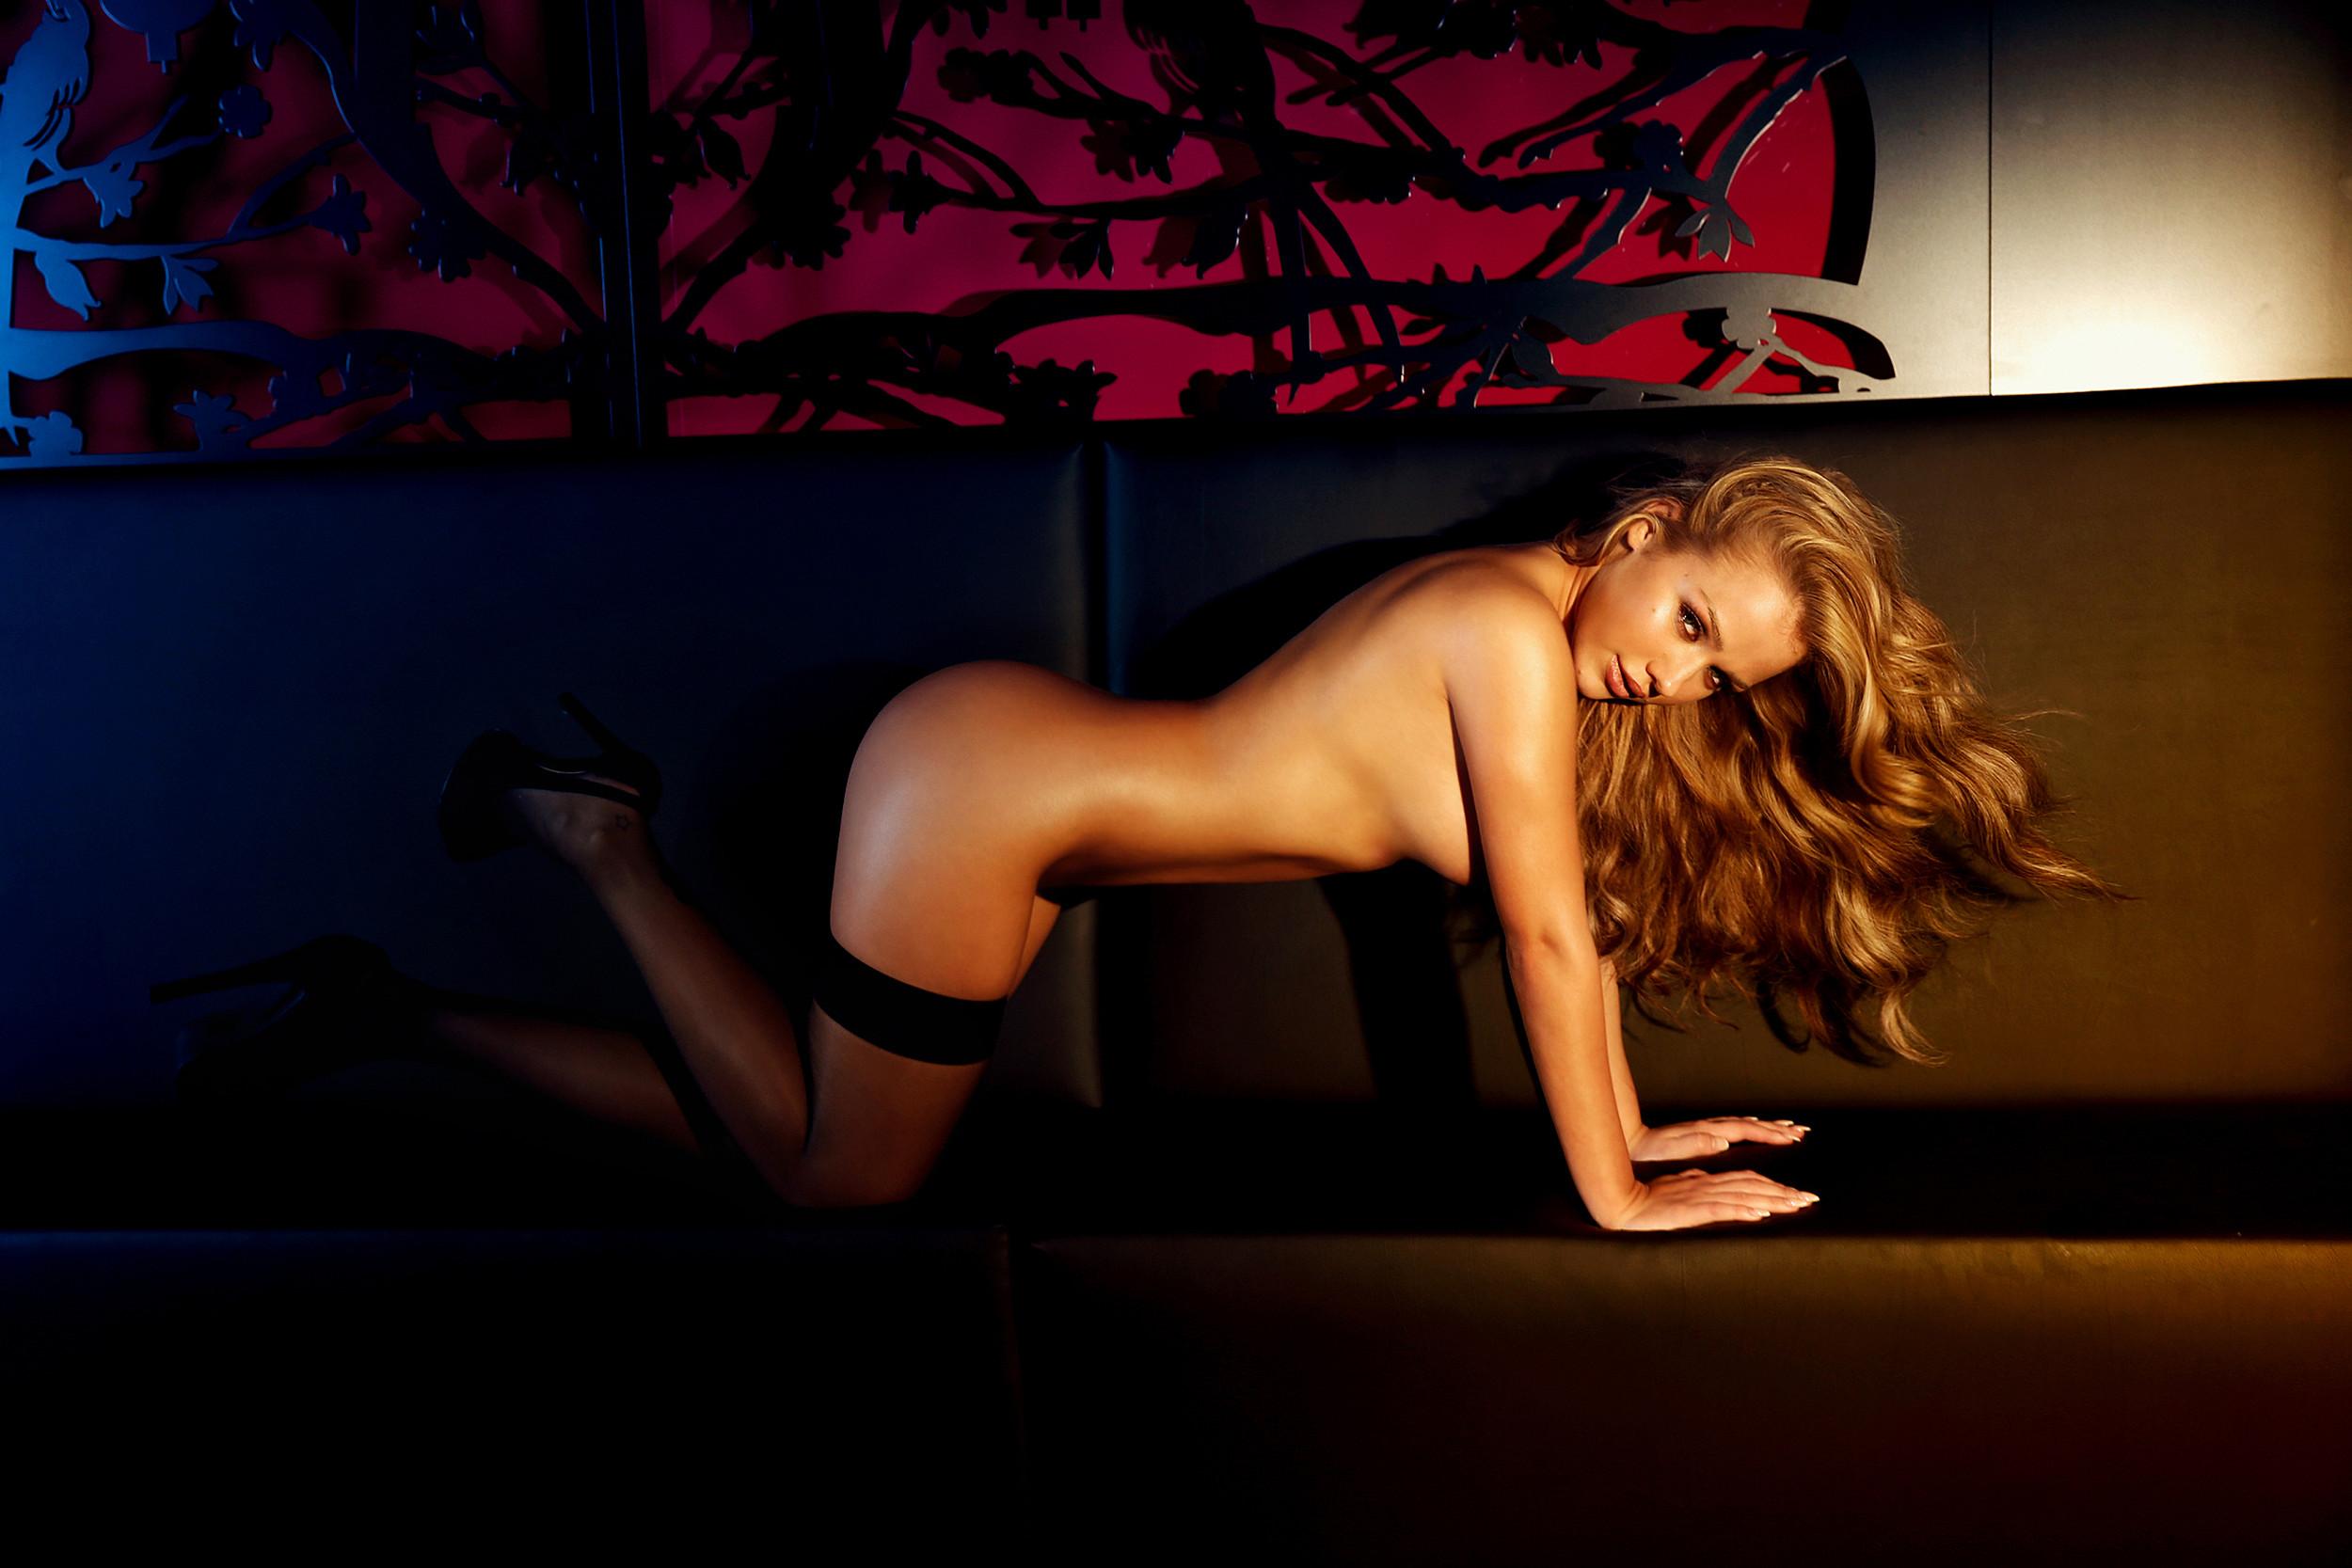 Kim hiott free playboy gallery hot naked babes